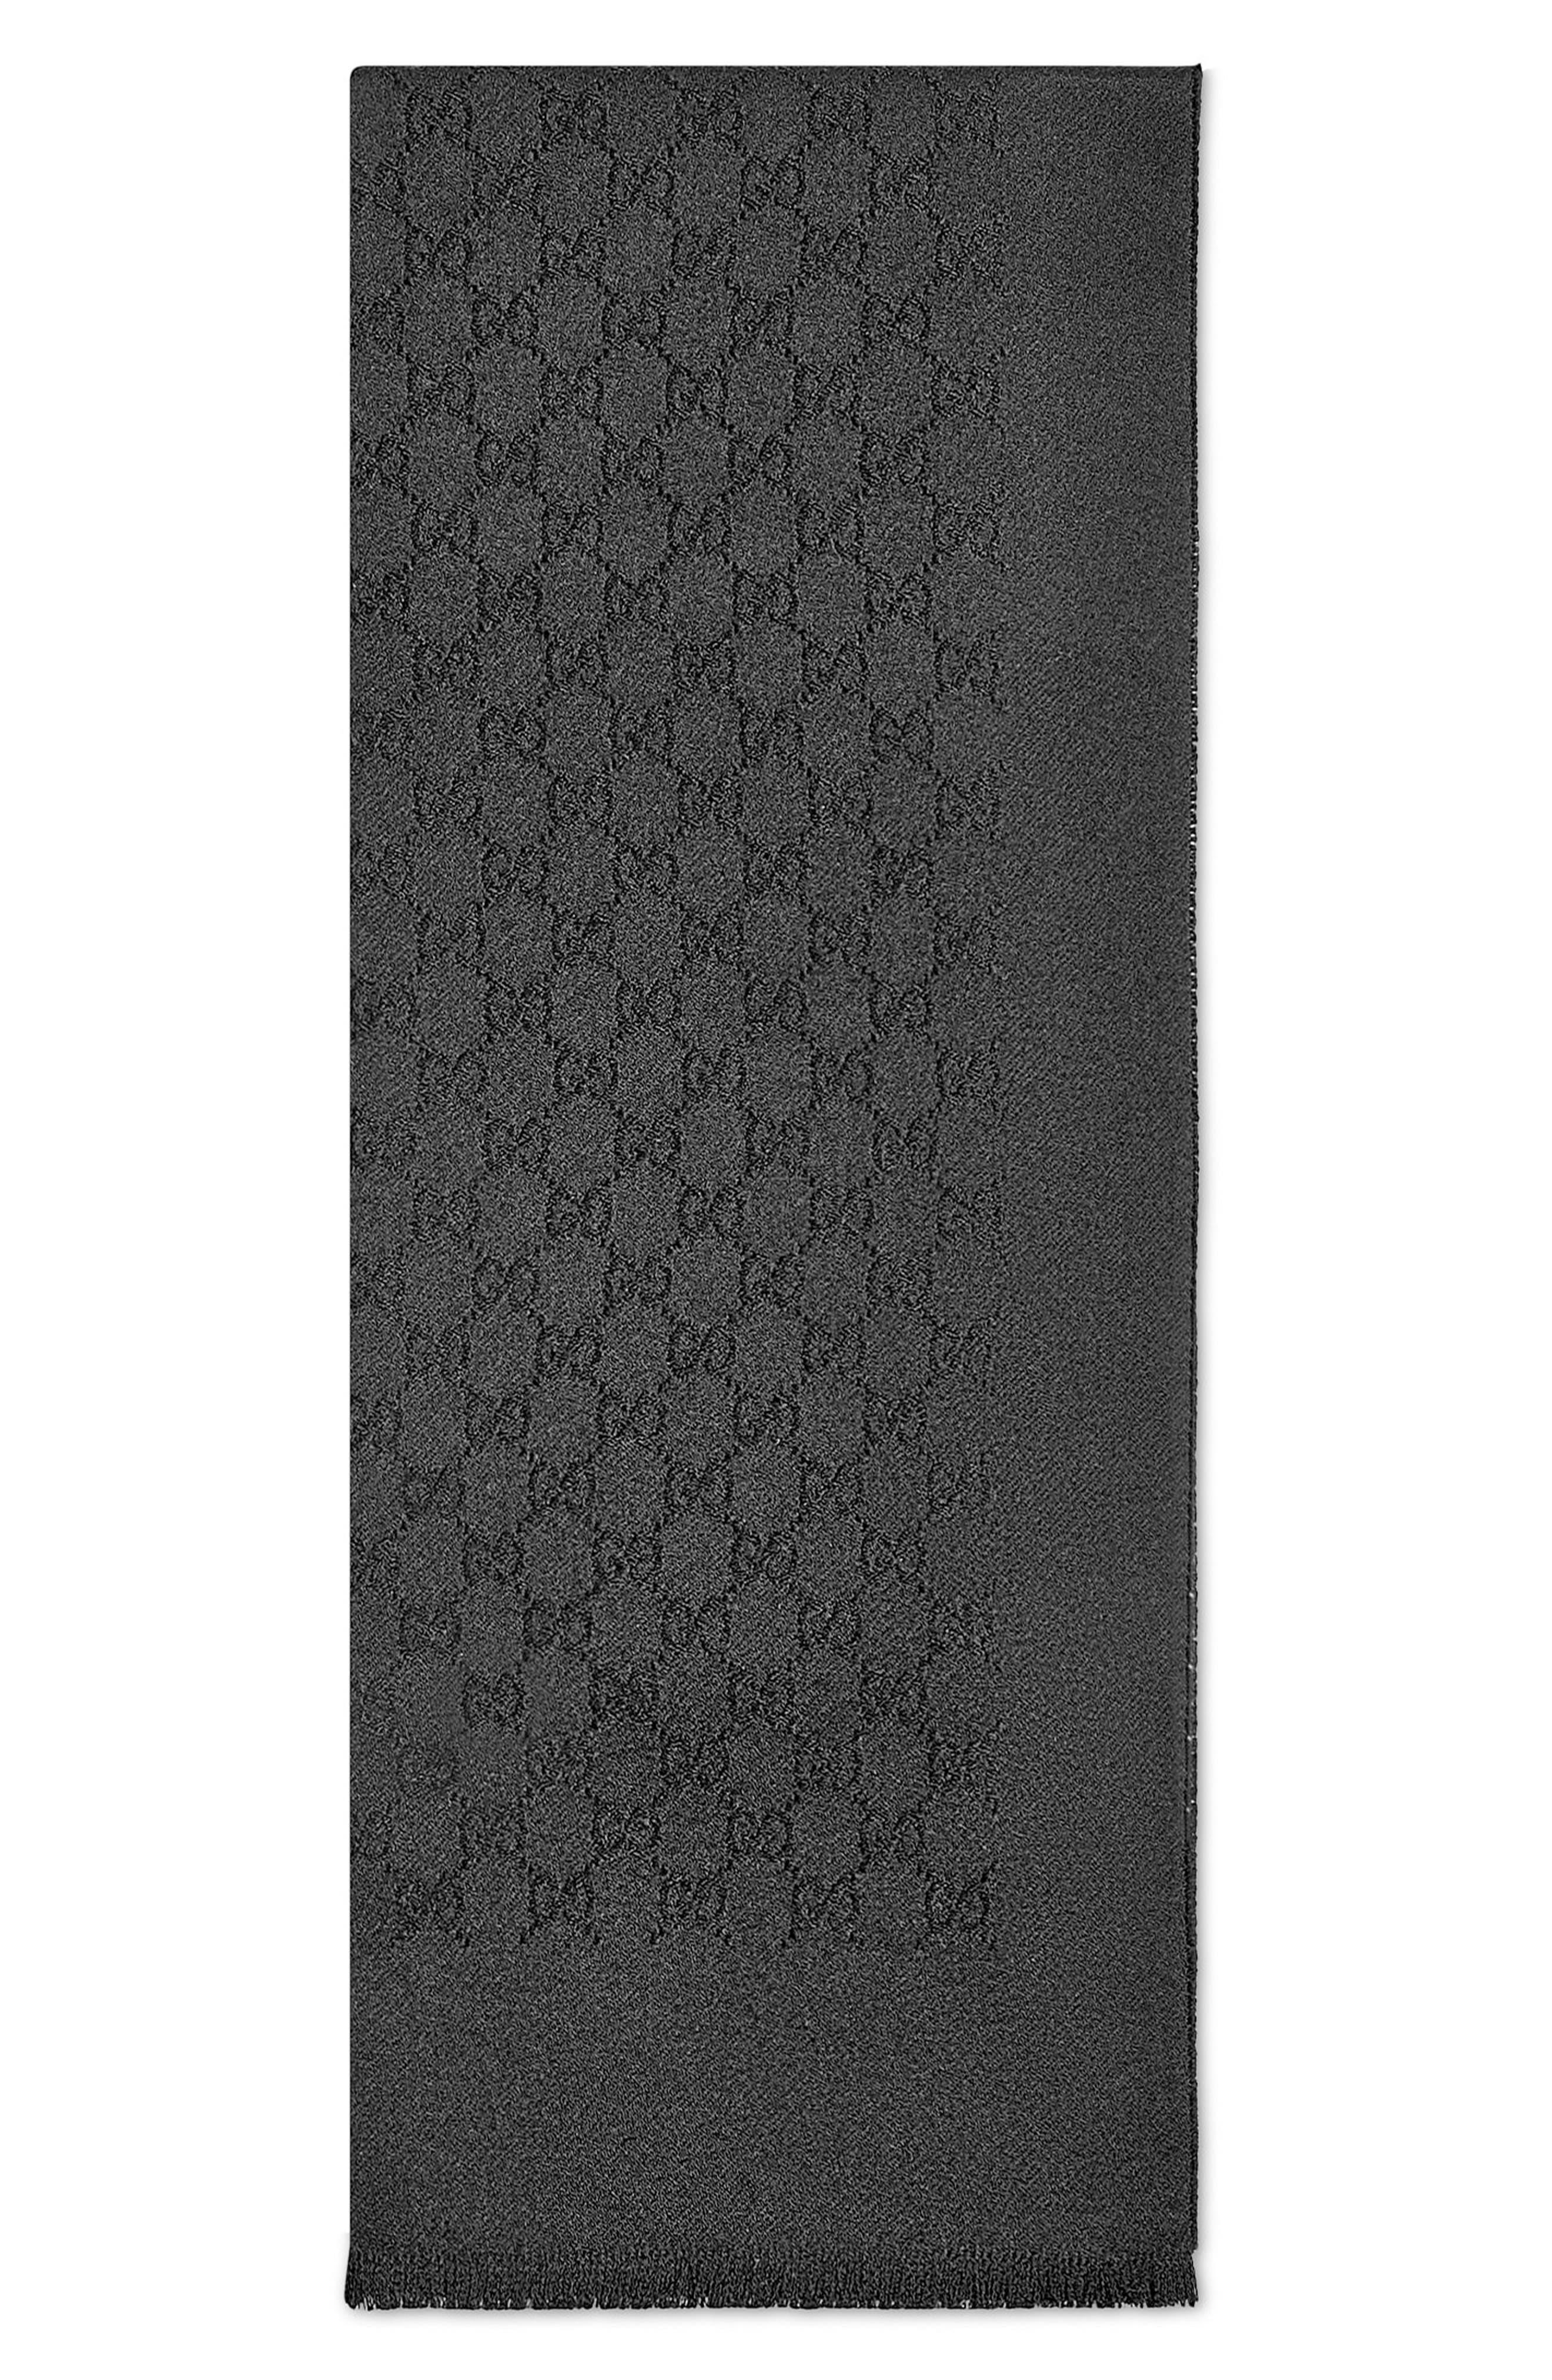 Gucci GG Gem Lux Jacquard Cashmere Scarf